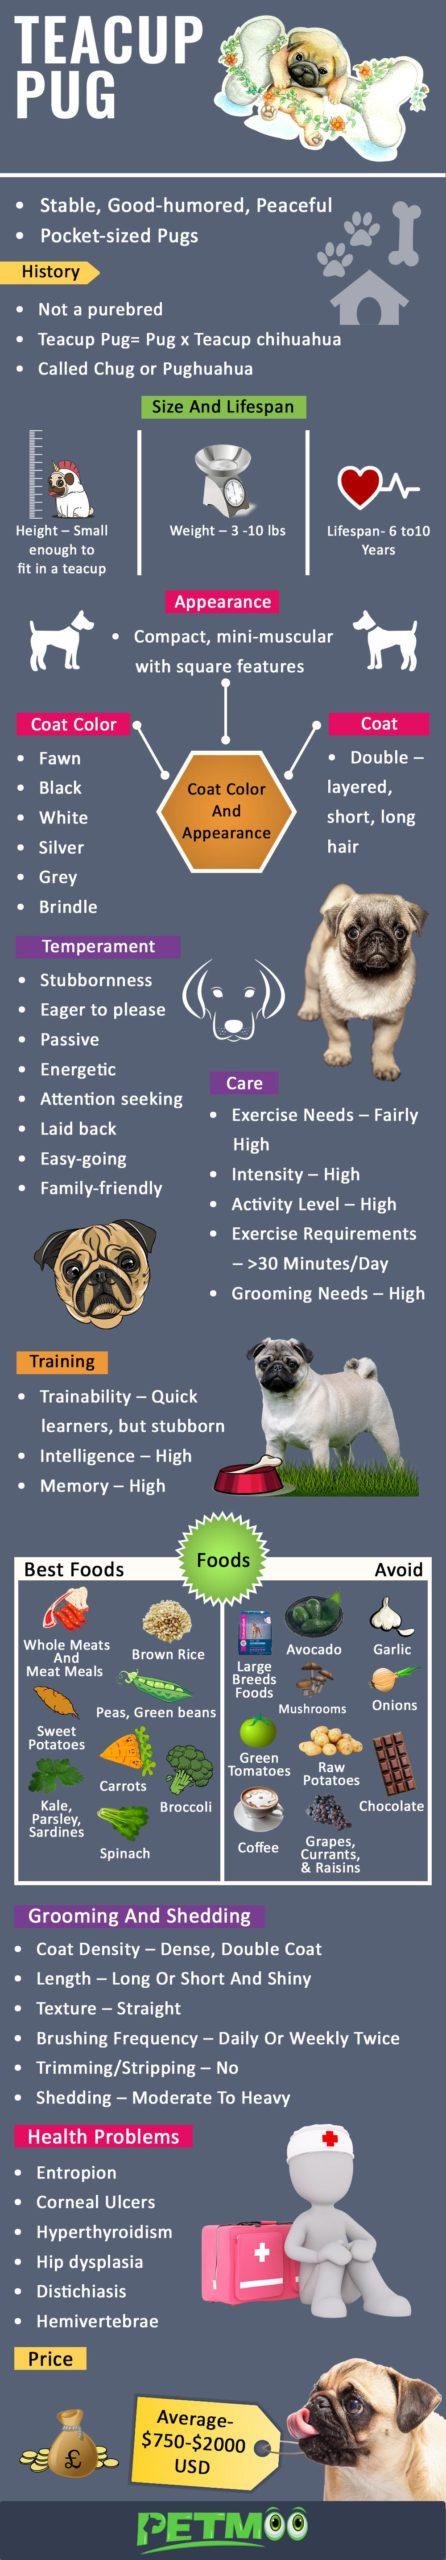 Teacup Pug Infographic